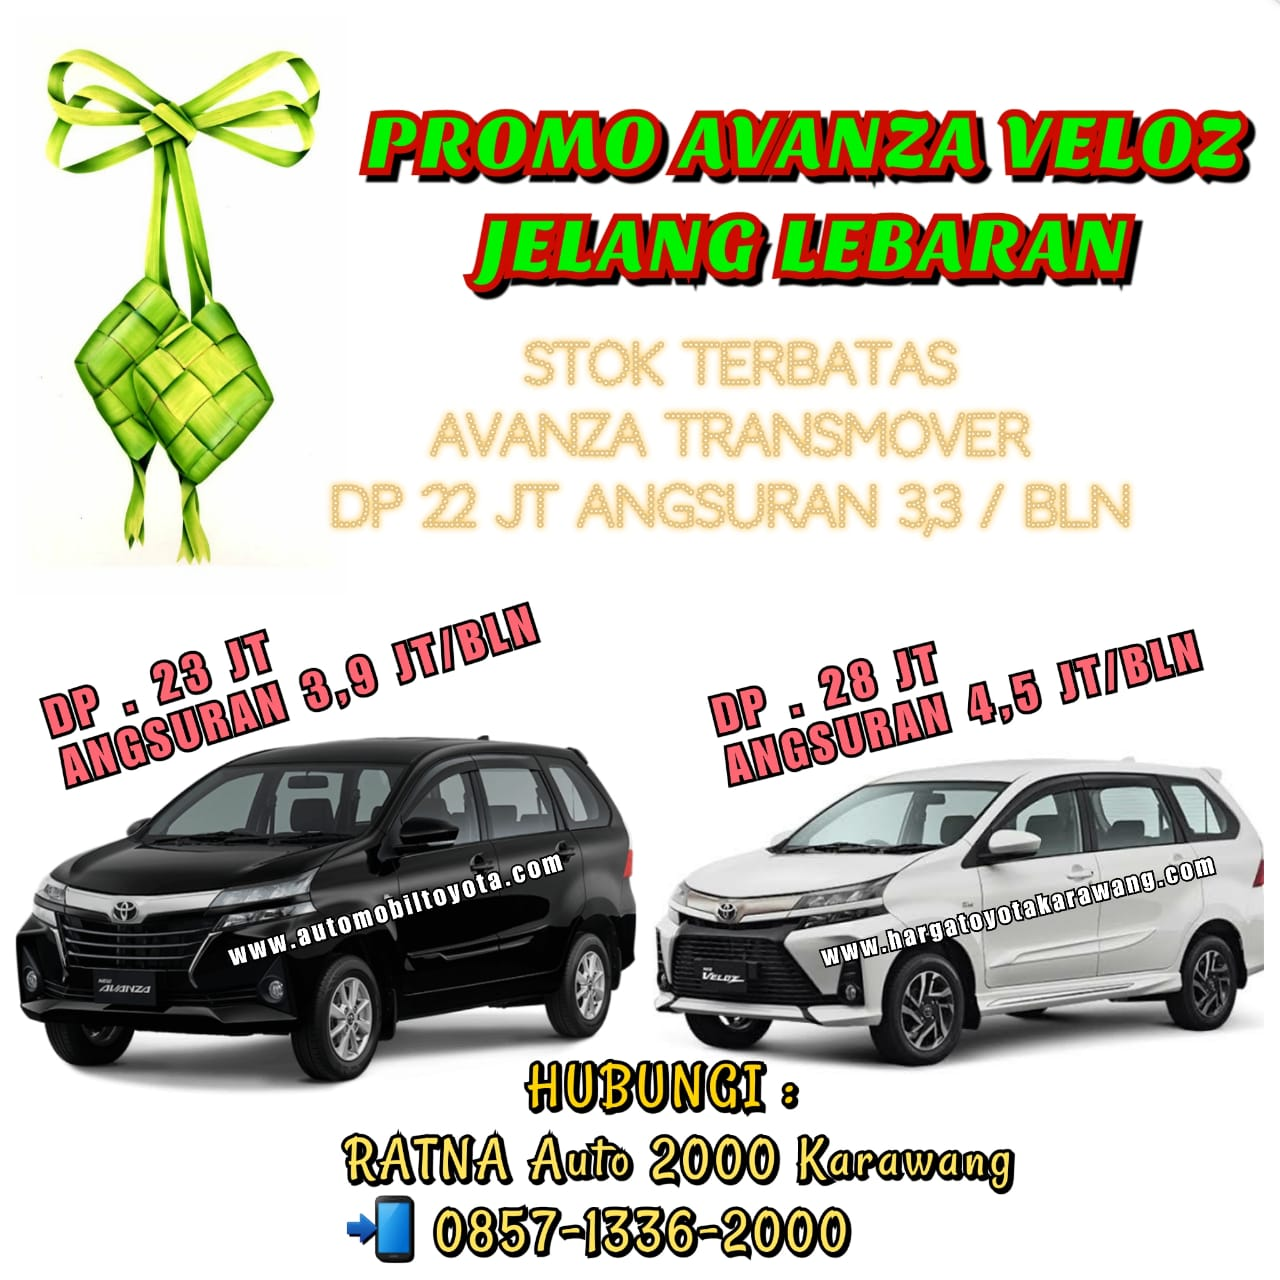 Promo Jelang Lebaran